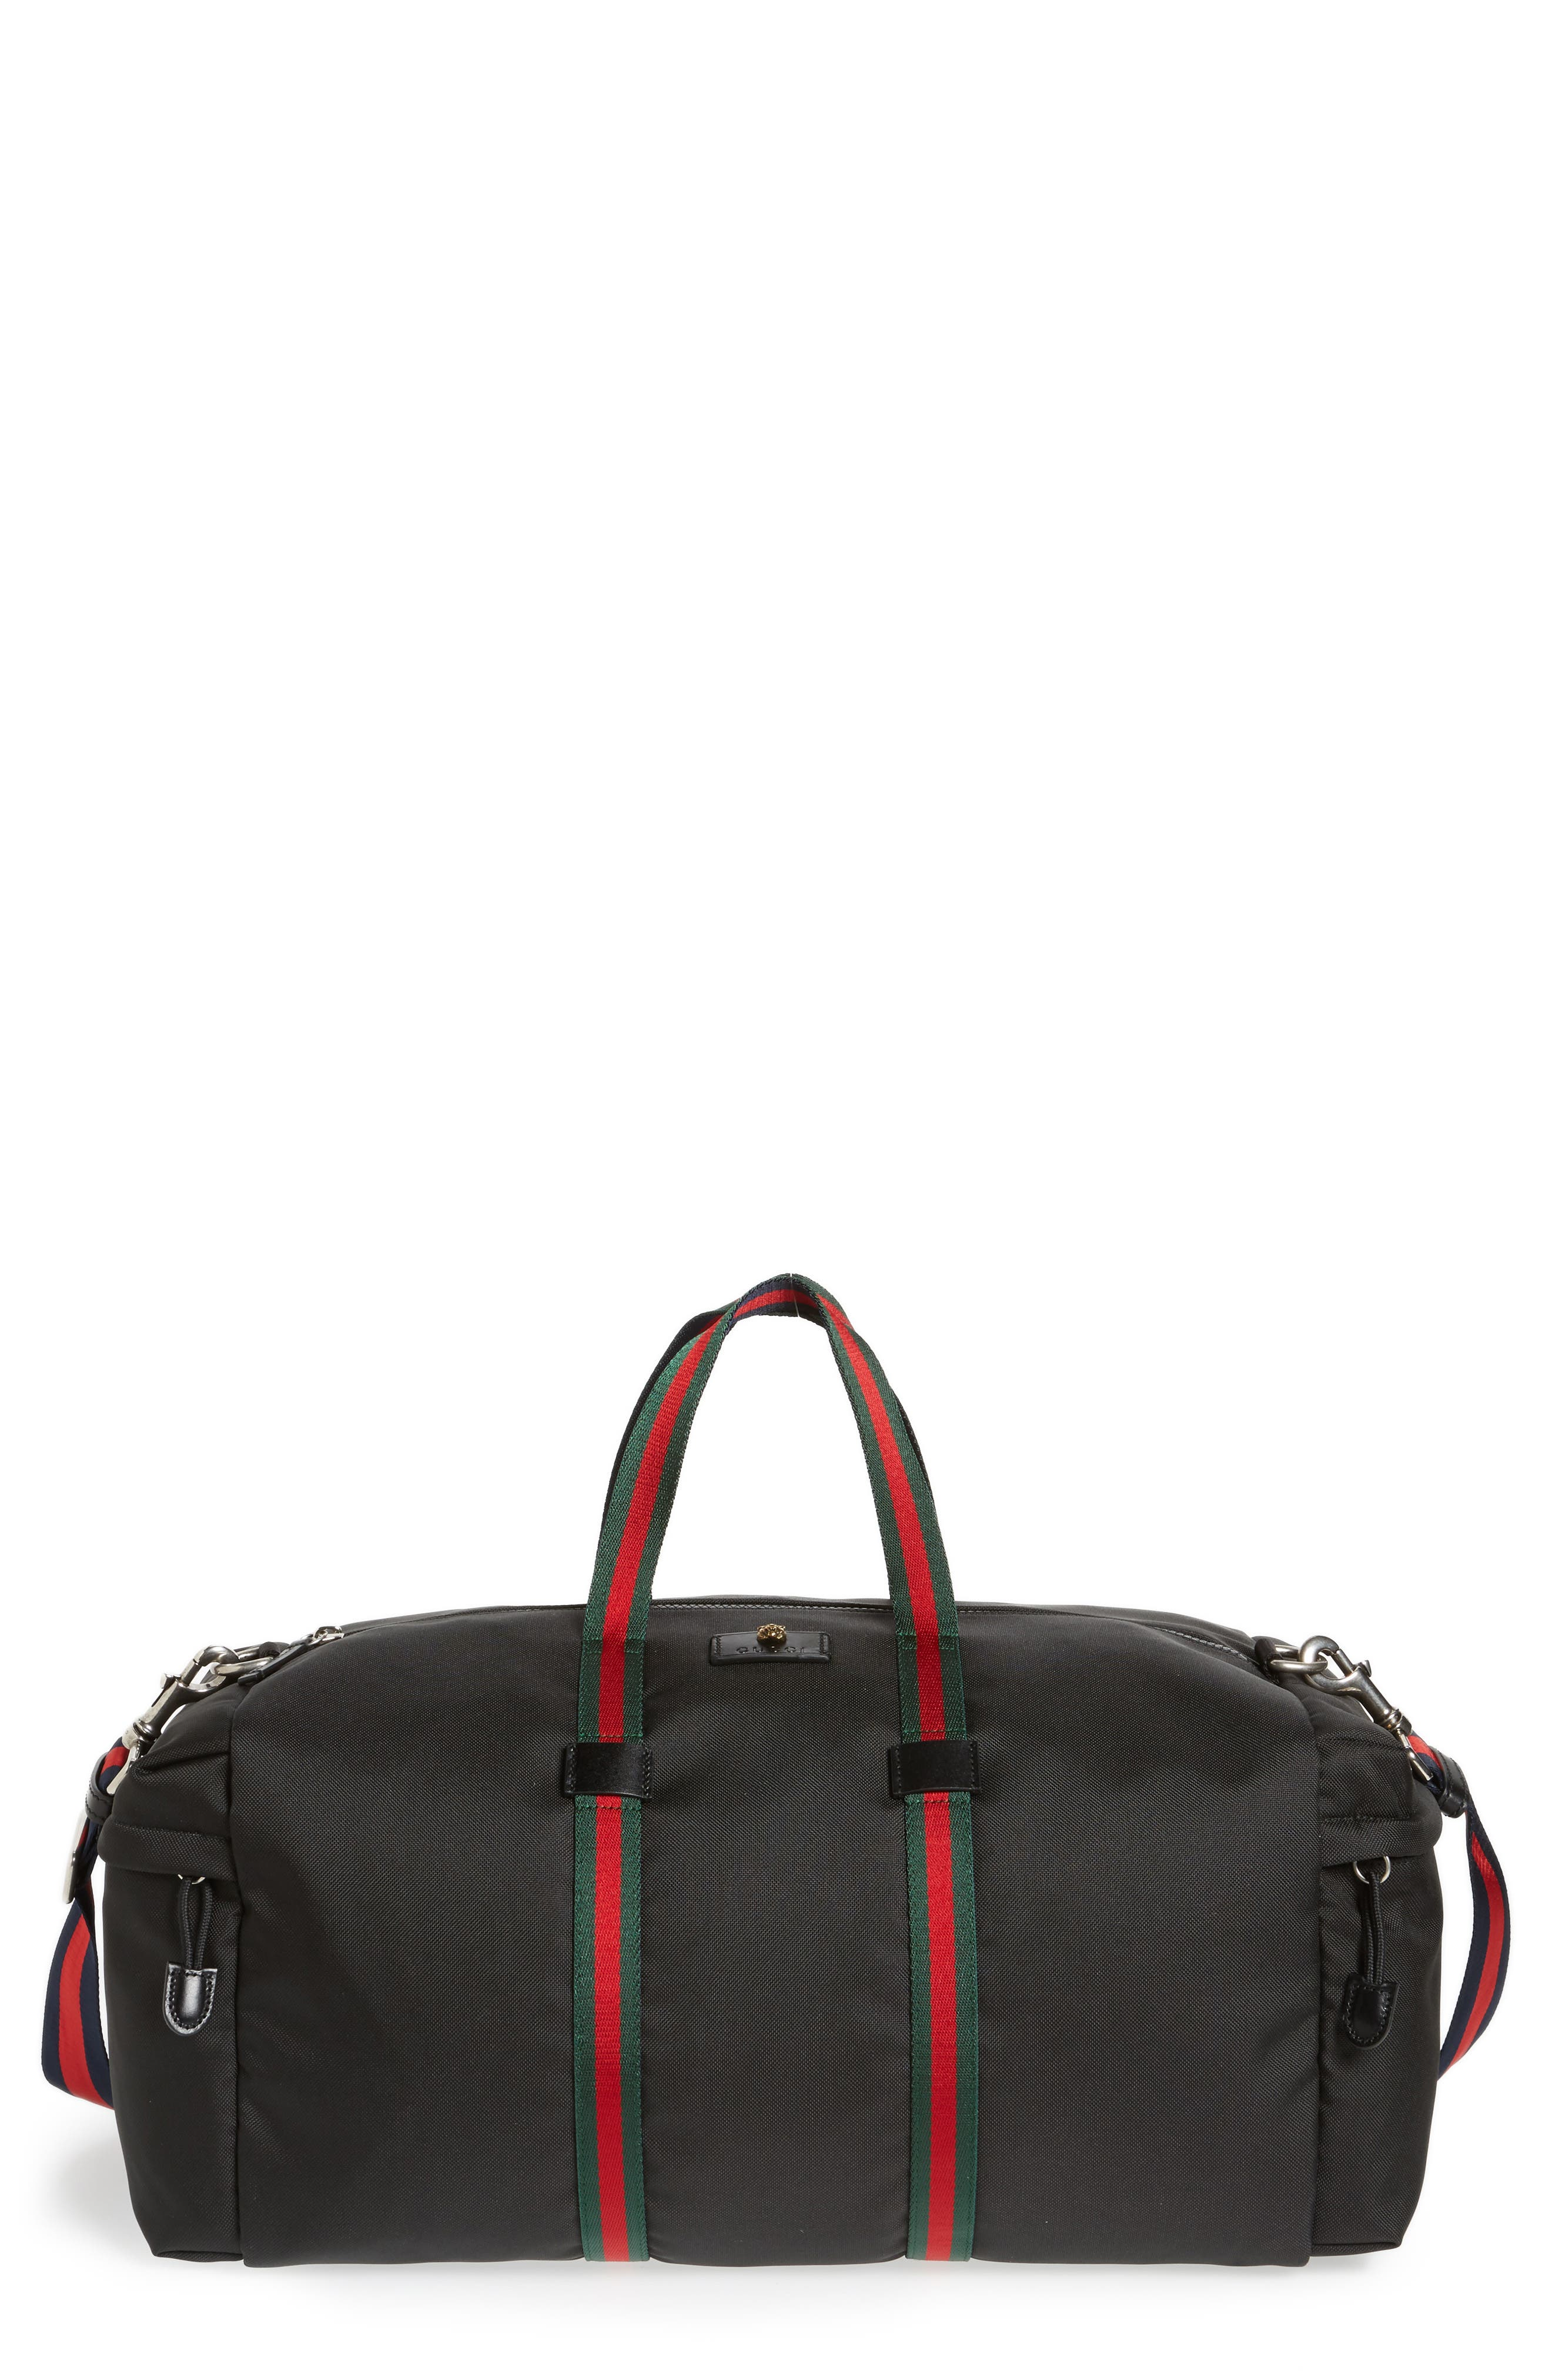 Main Image - Gucci Techpack Canvas Duffle Bag